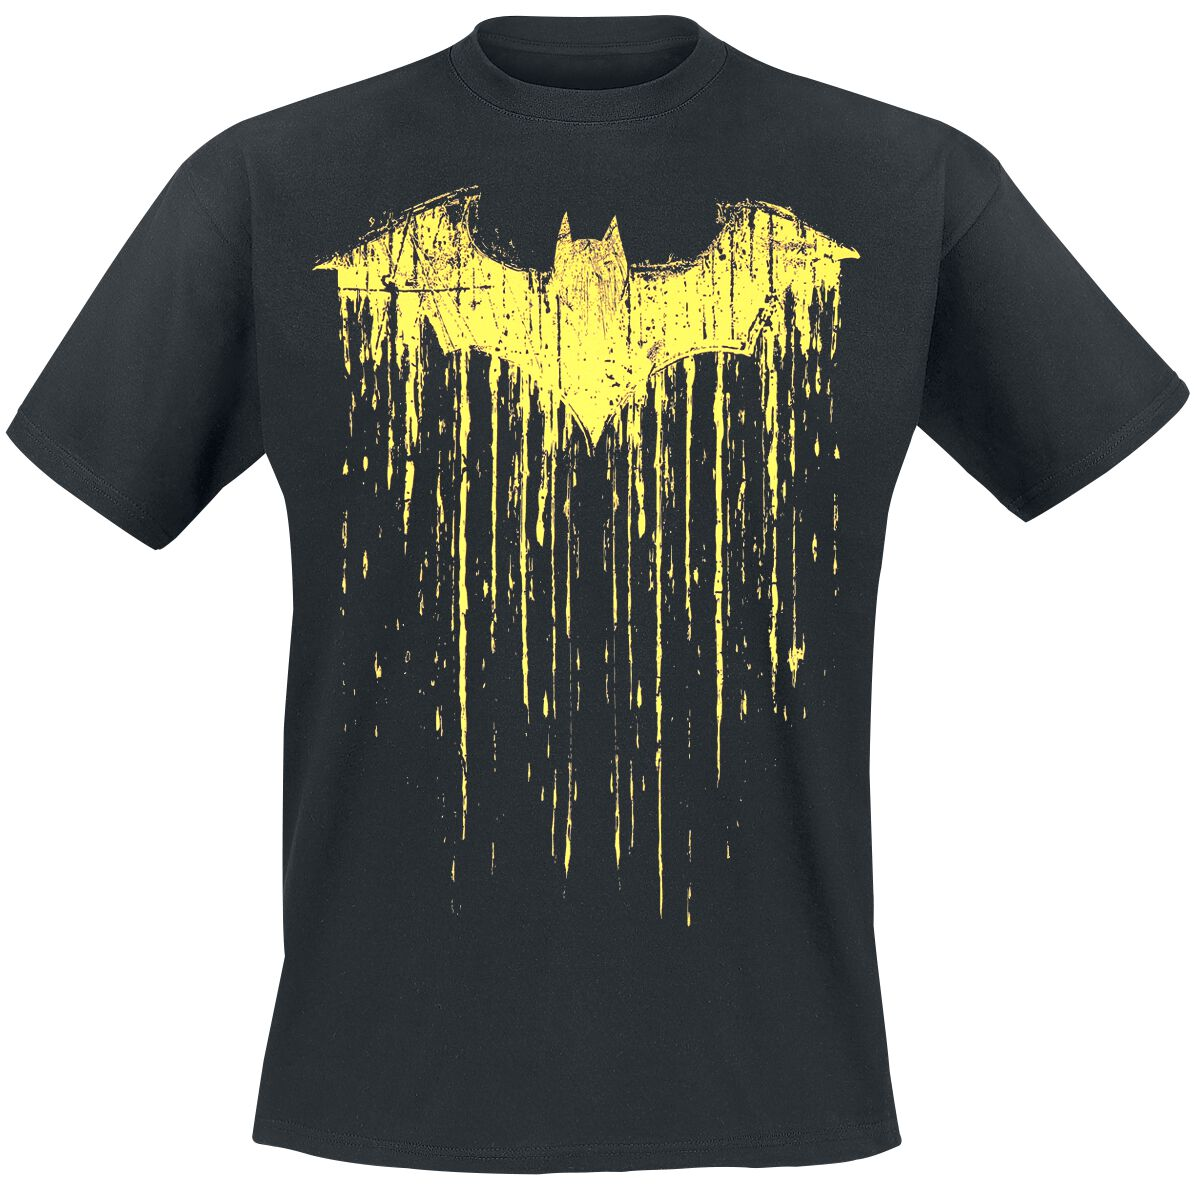 Image of   Batman Dripping Paint T-Shirt sort